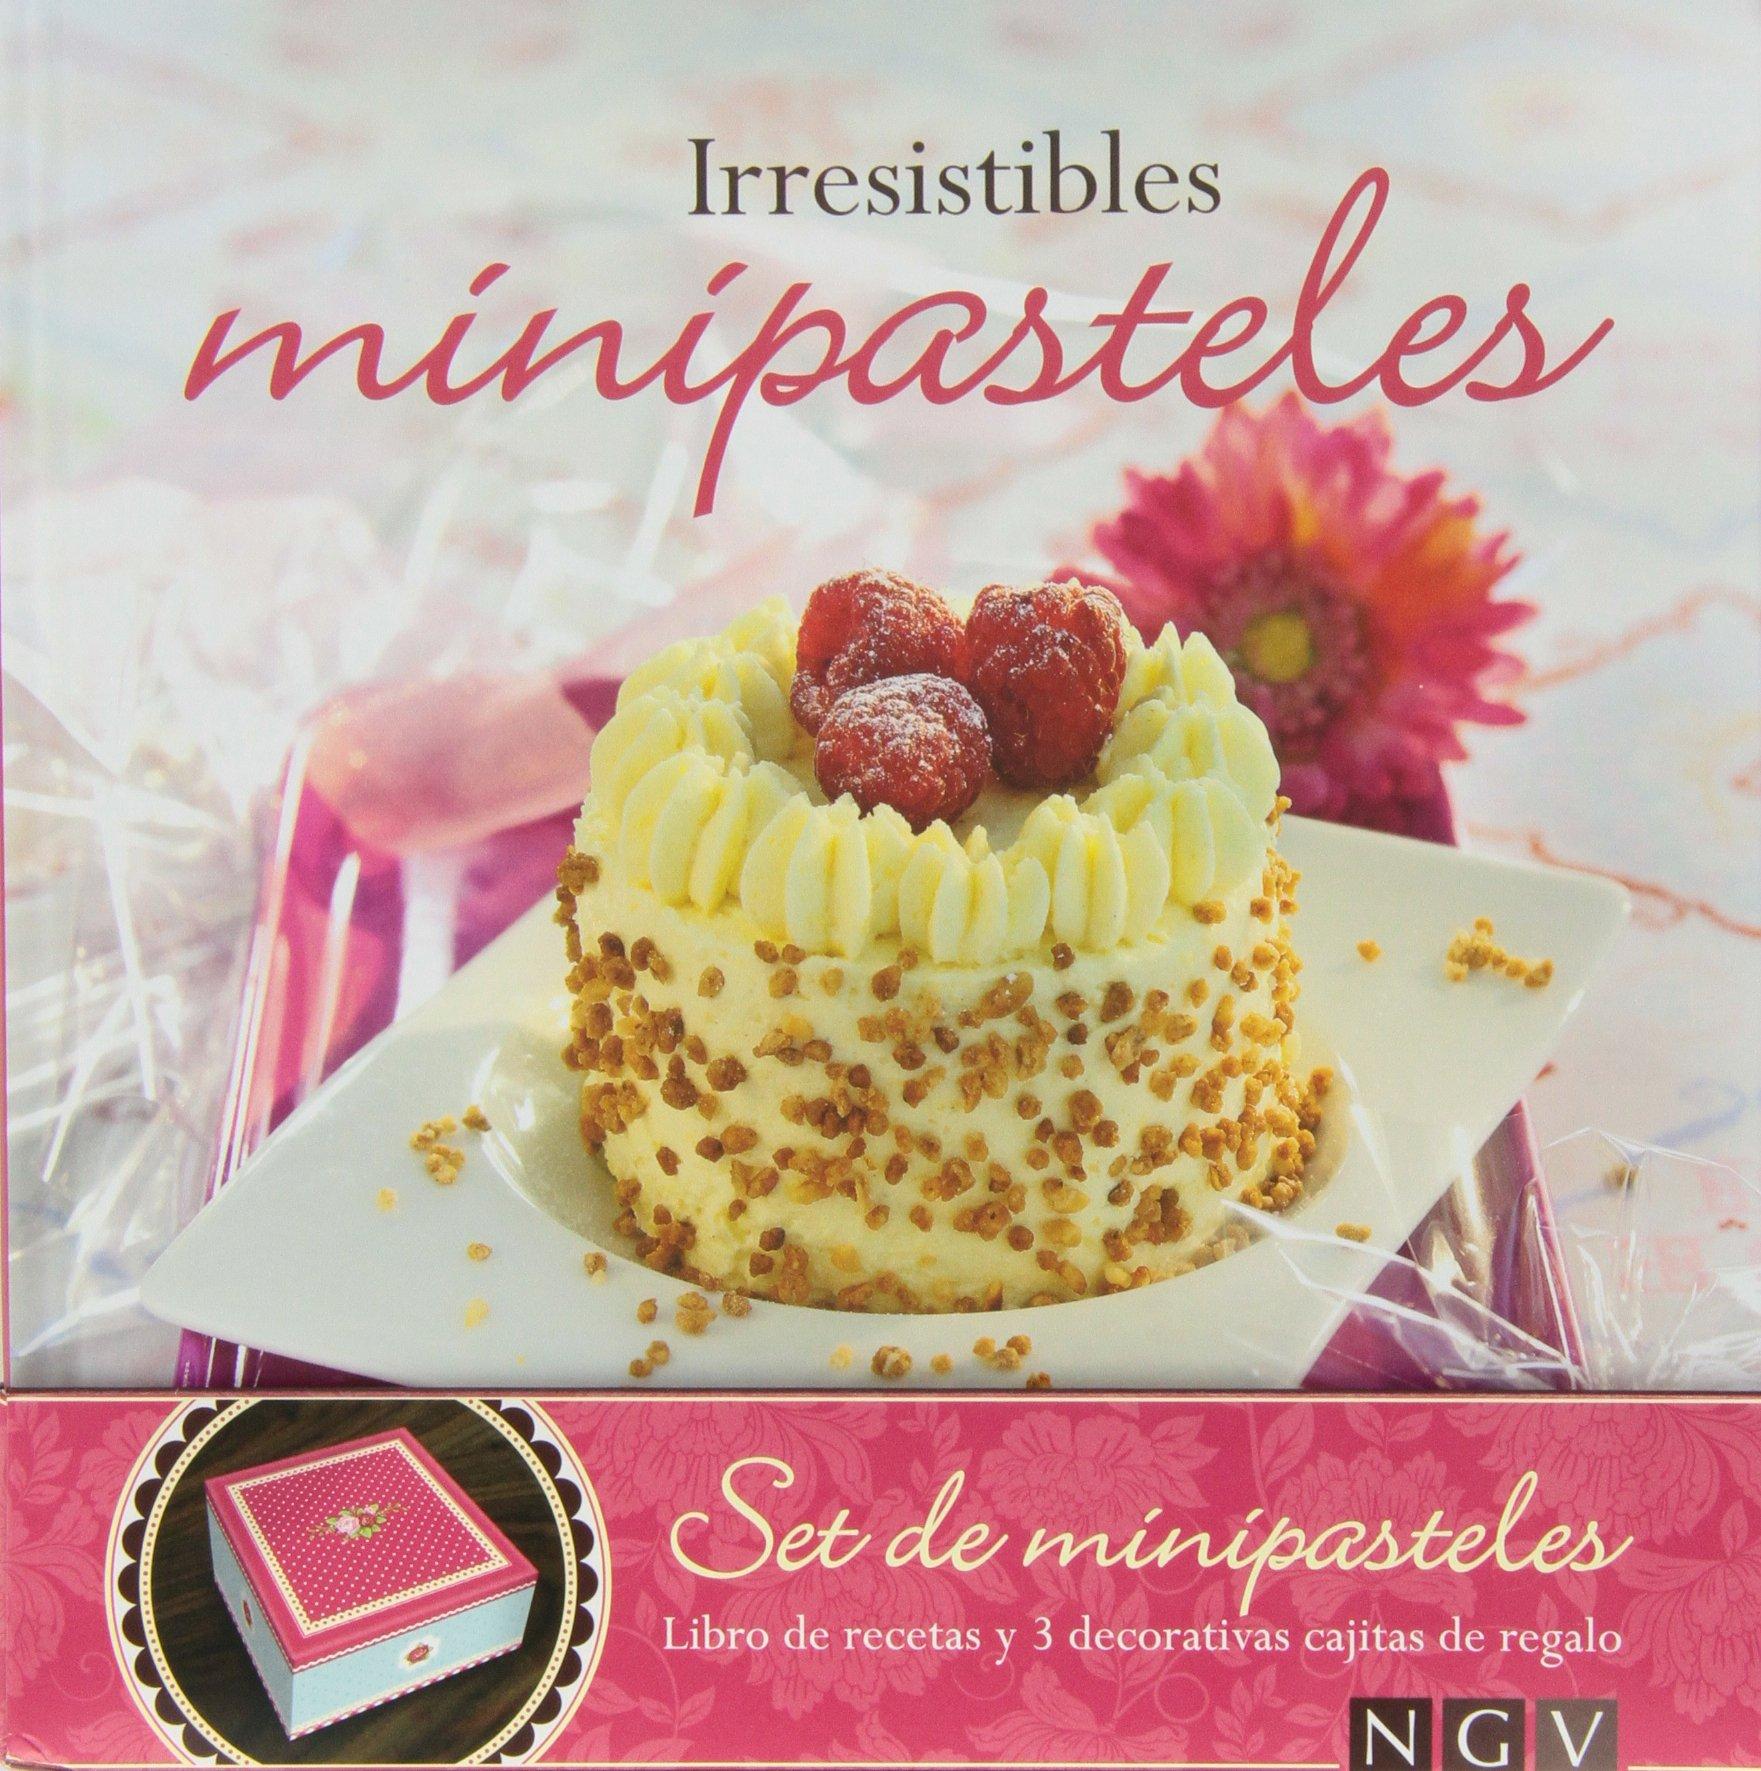 IRRESISTIBLES MINIPASTELES: VARIOS(003250): 9783625003250: Amazon.com: Books